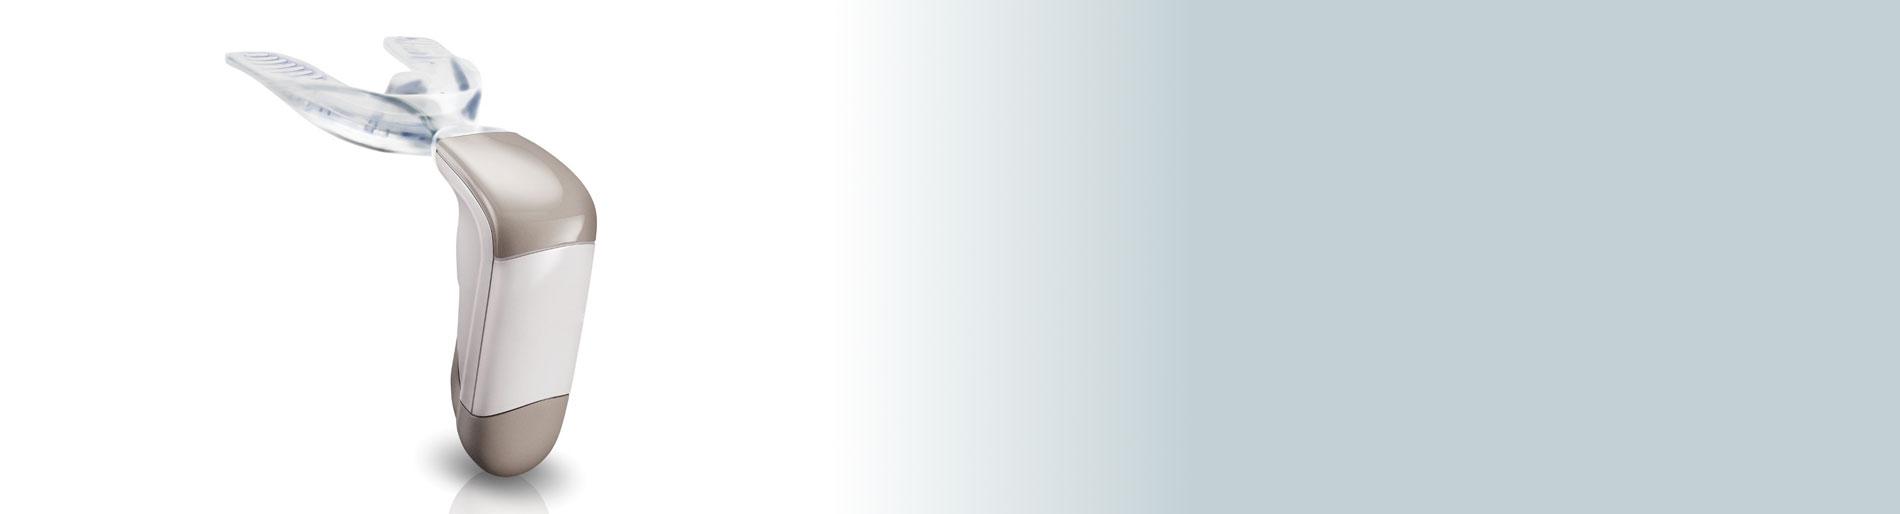 Acceledent acceleratore odontoiatrico Invisalign